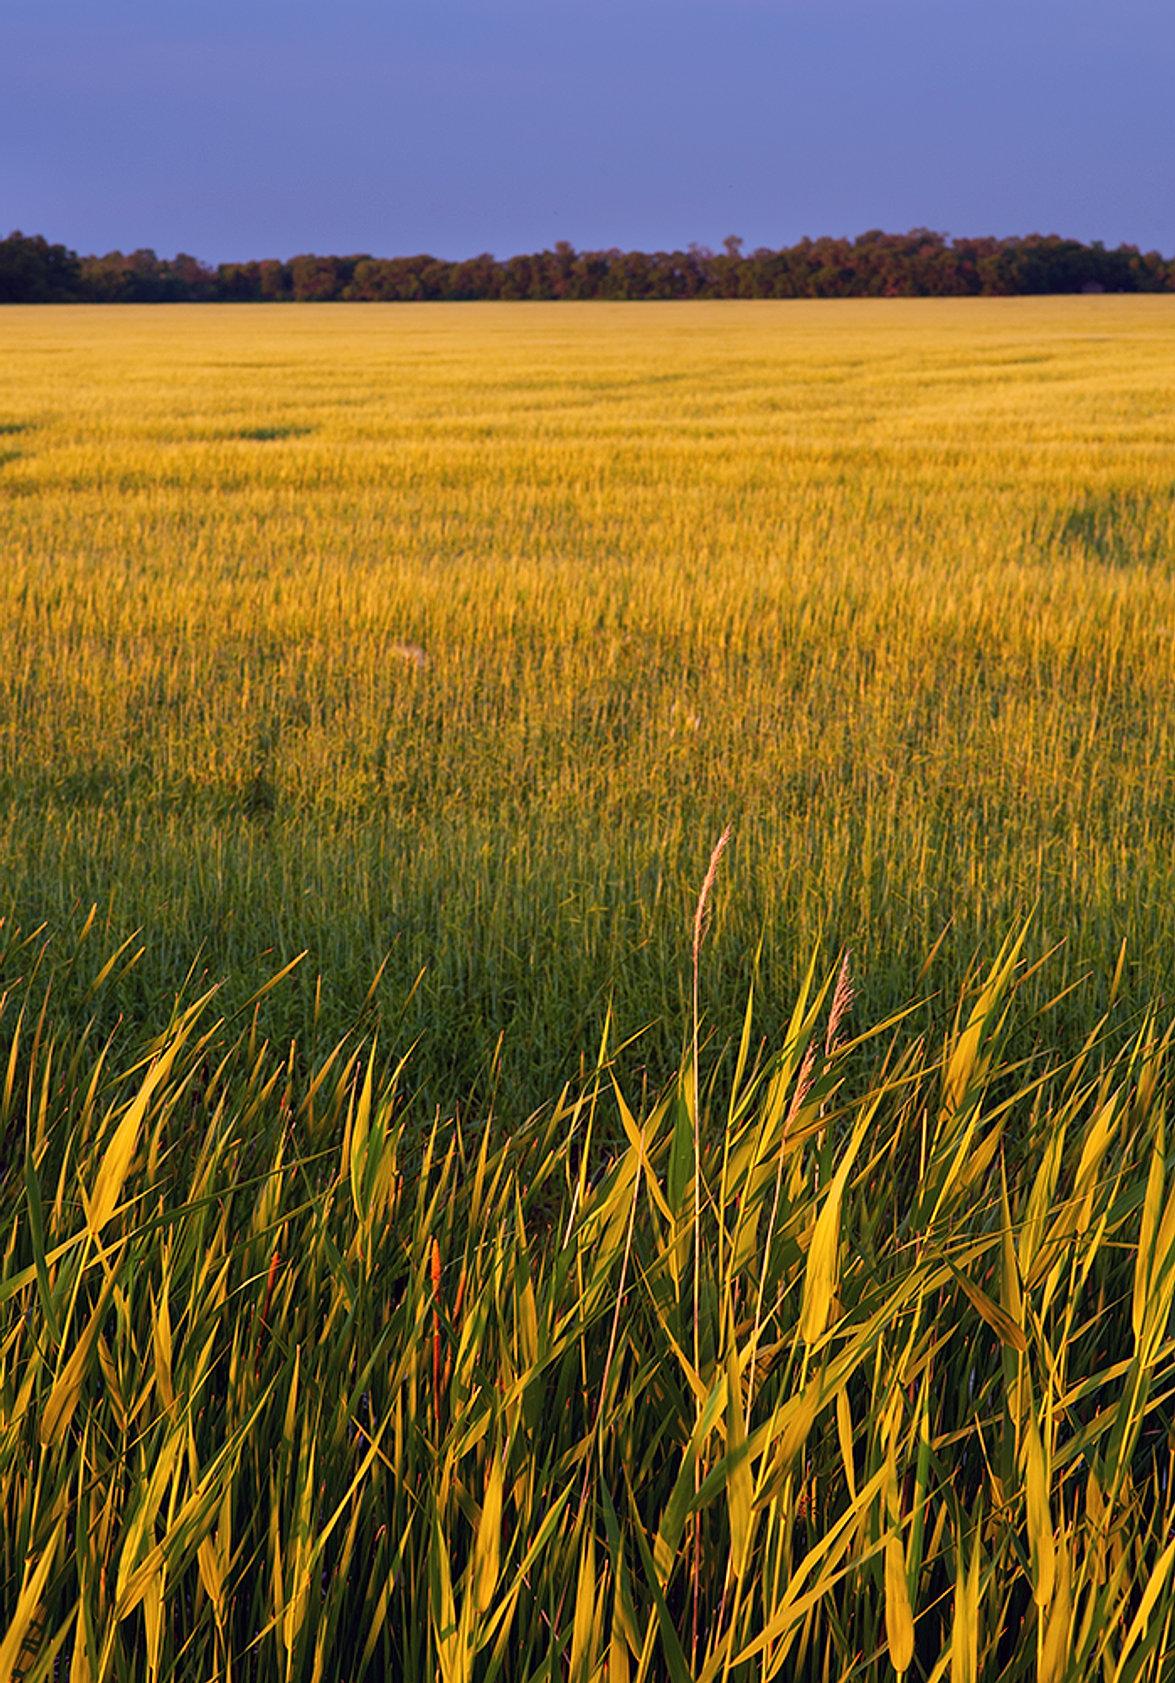 Landscape Photograph of Agriculture